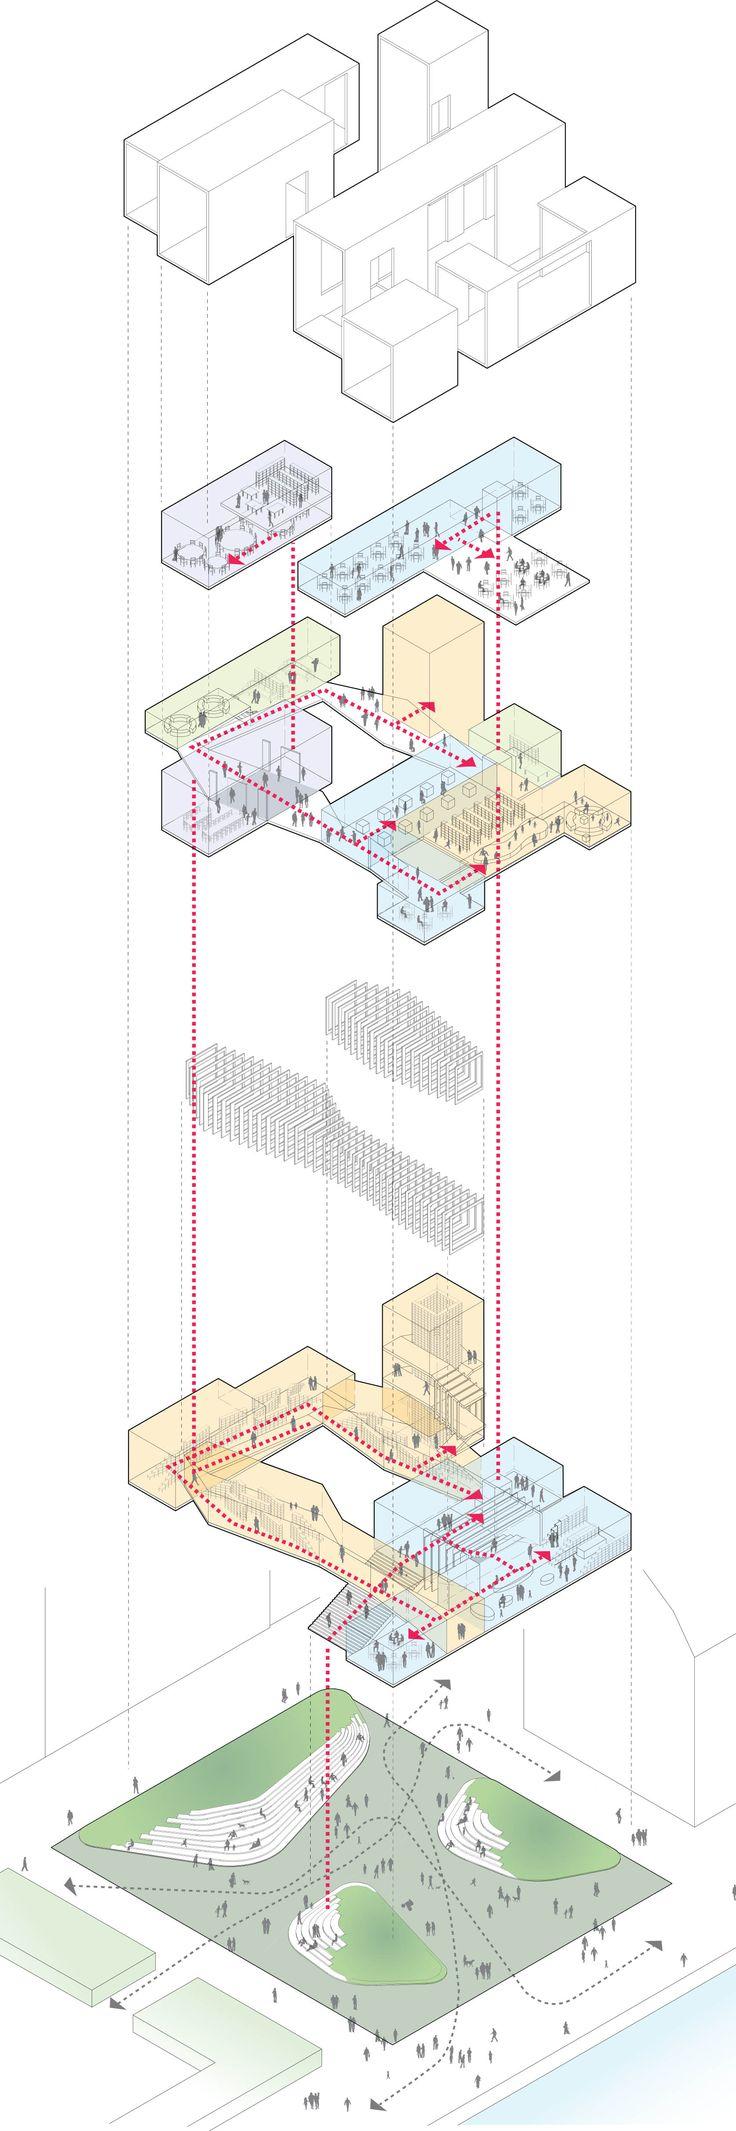 Copenhagen New Library pdp[east] axonometric diagram. 제일 아래 동선과 유리박스들 동선 보여죽ㅣ